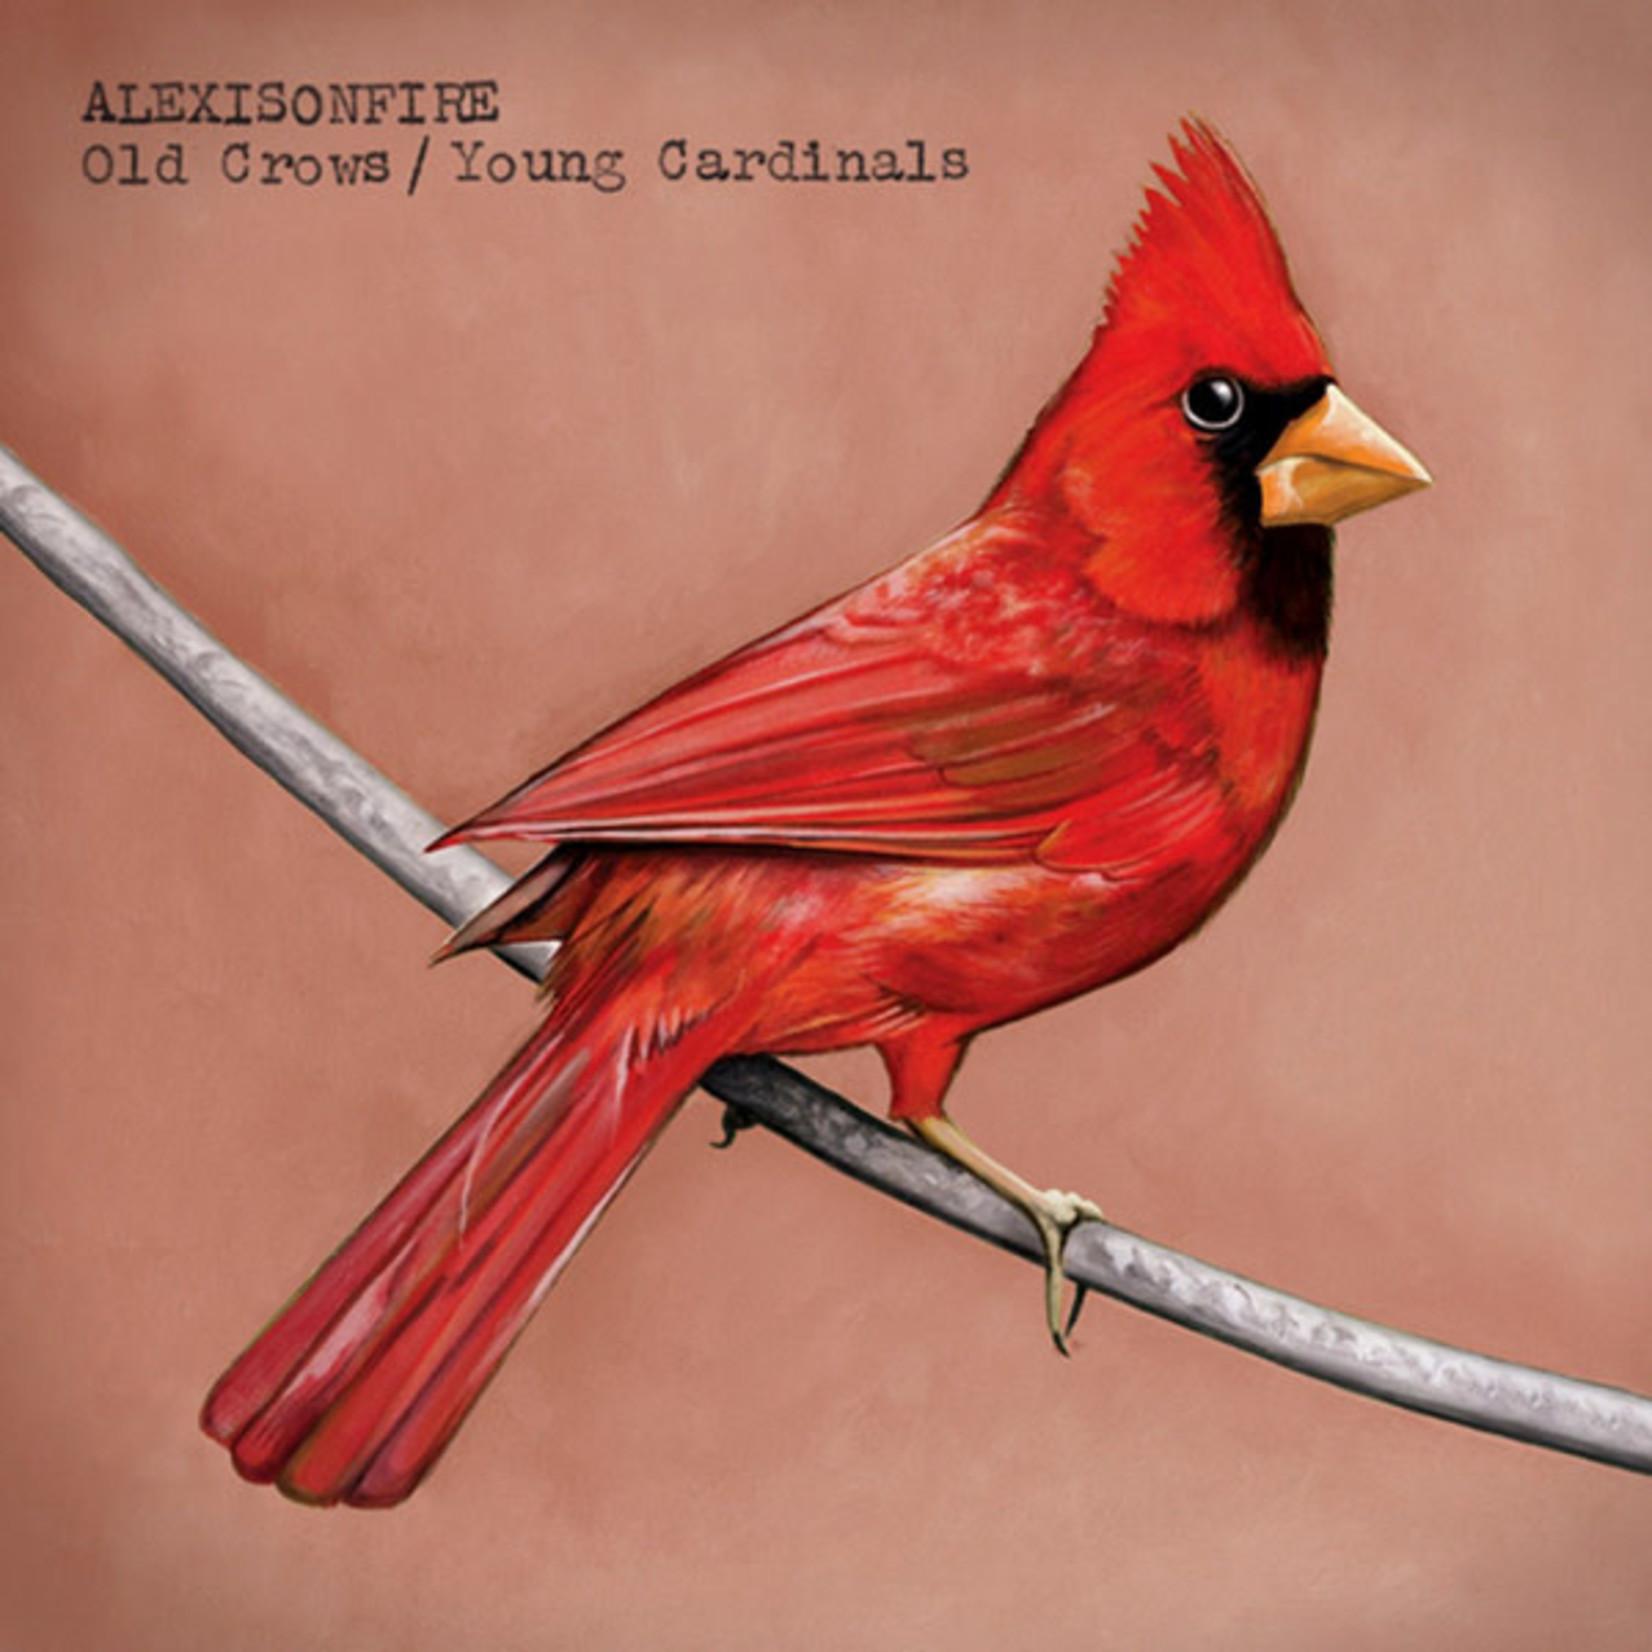 Vinyl Alexisonfire - Old Crows / Young Cardinals